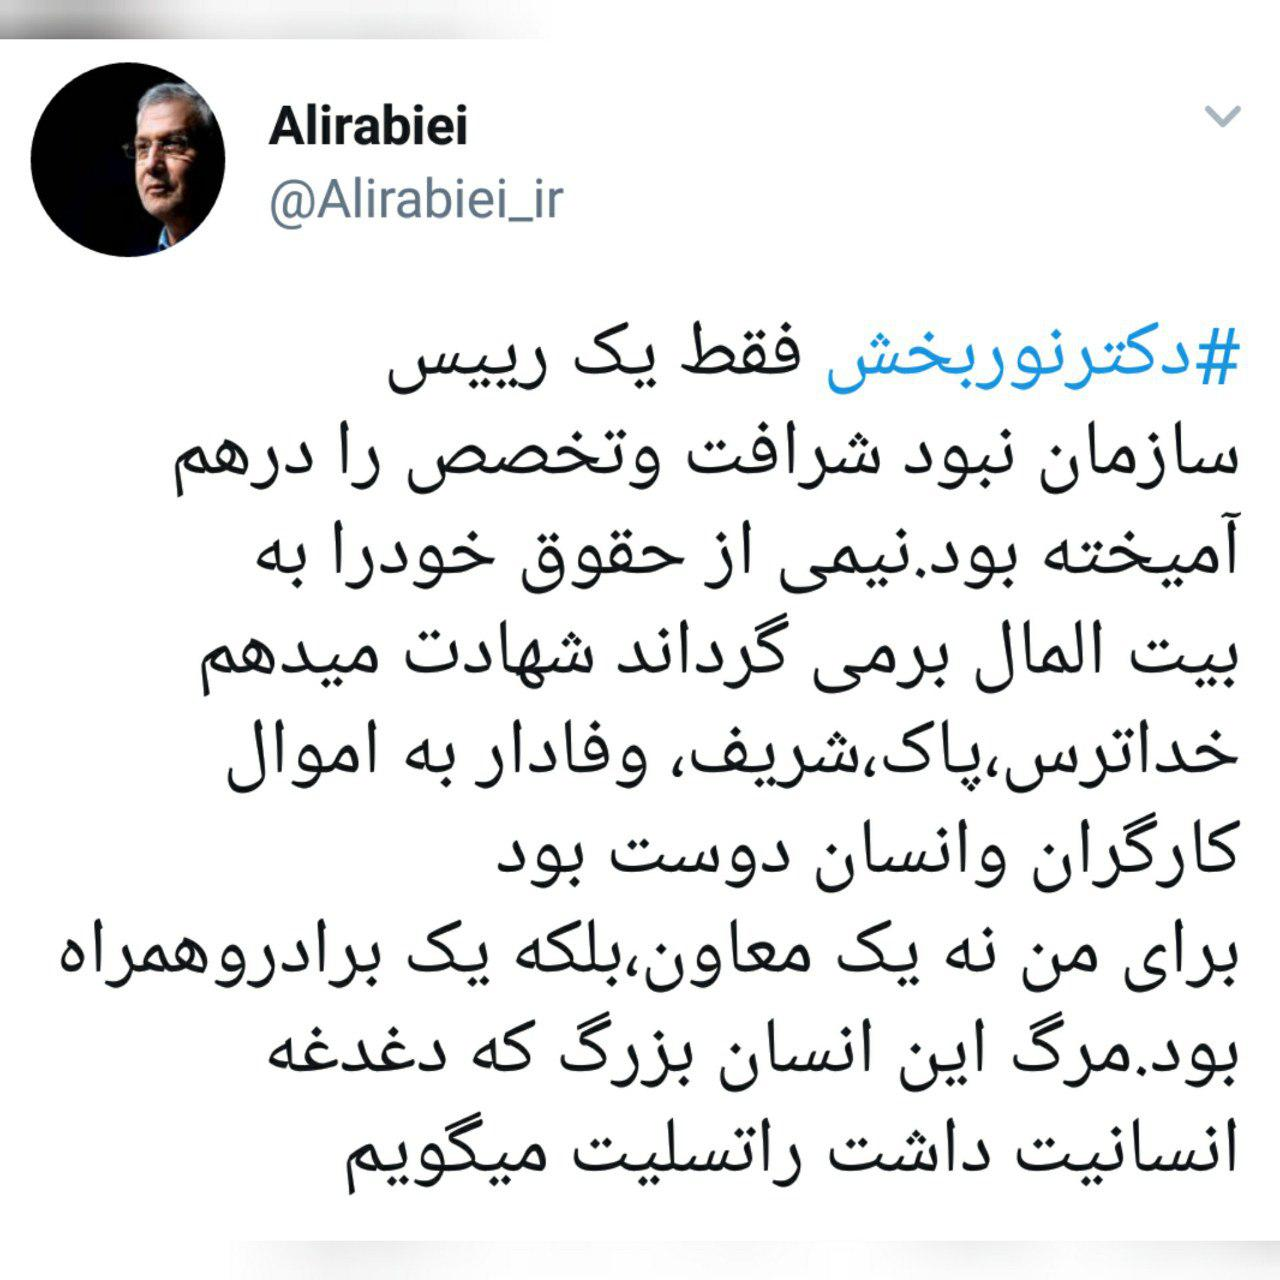 photo 2018 11 15 19 27 26 - واکنش ربیعی به درگذشت سیدتقی نوربخش